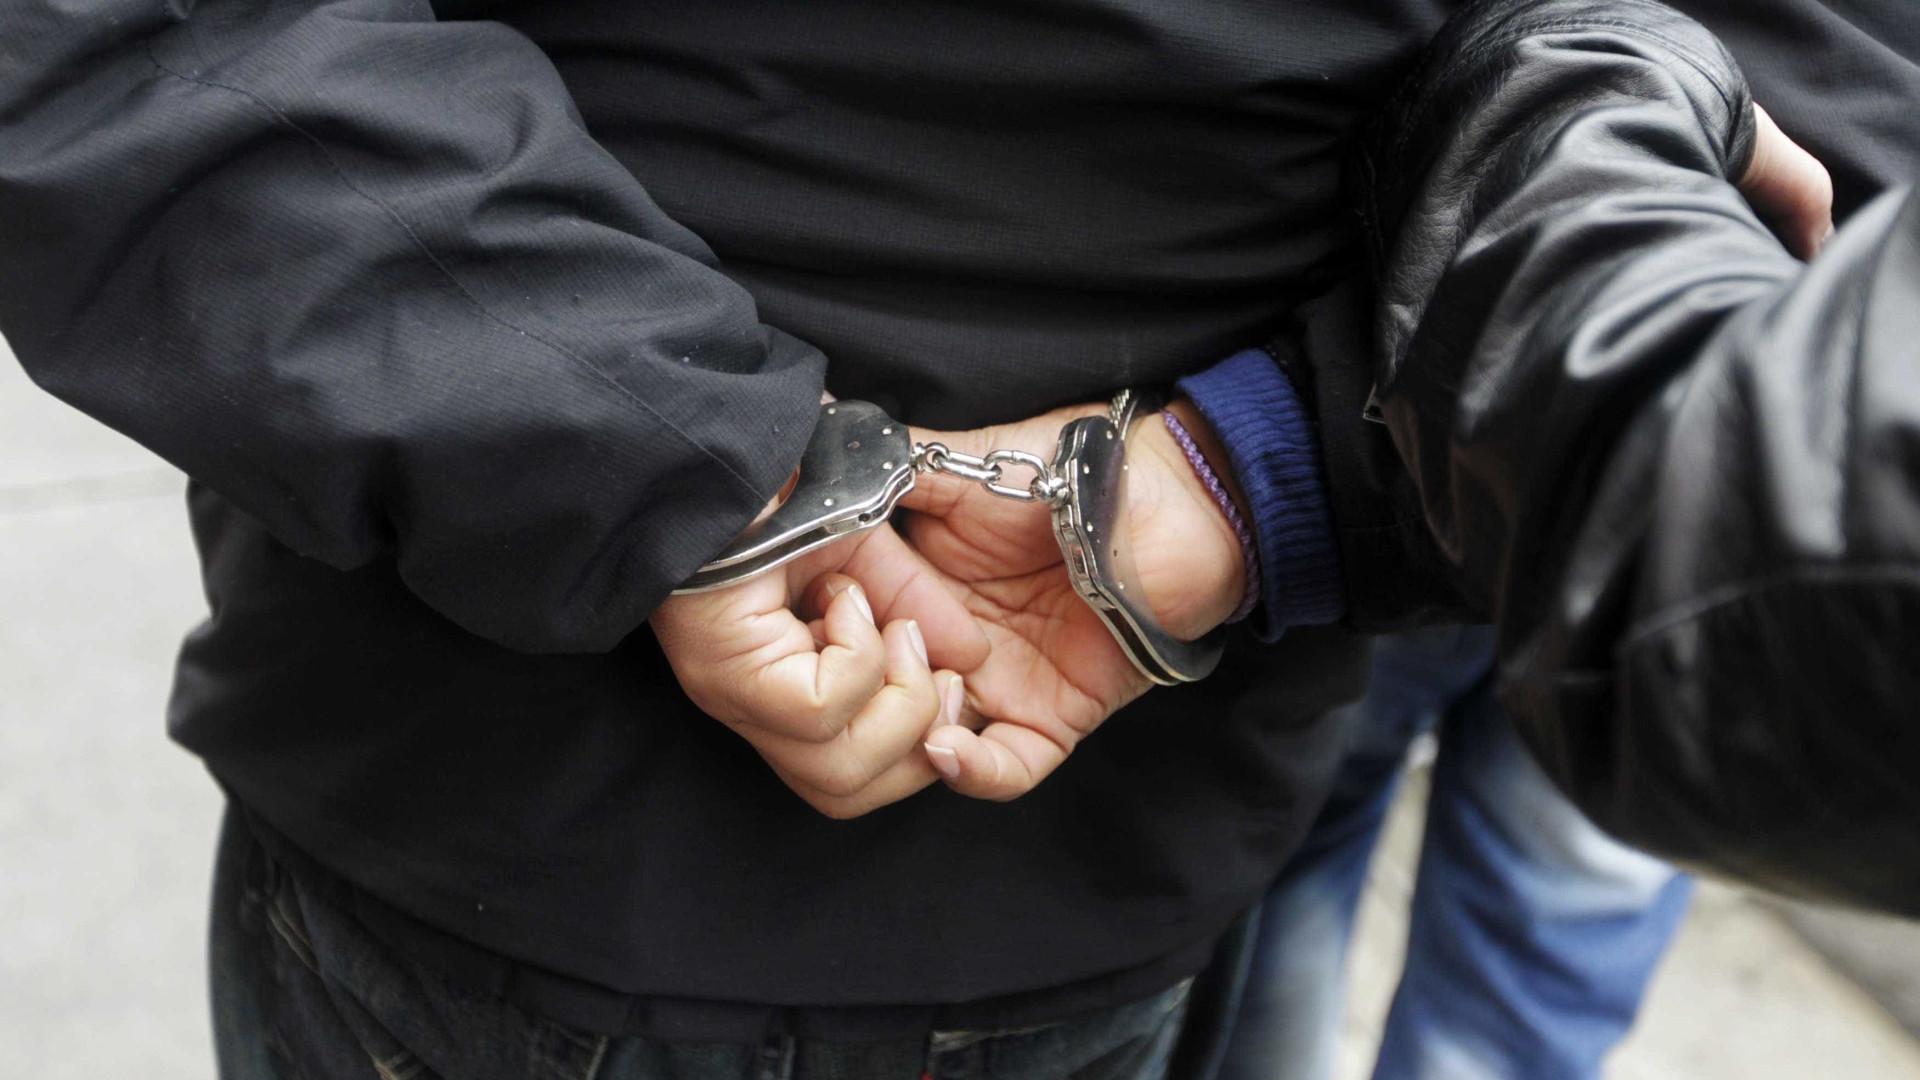 Idoso de 70 anos é preso suspeito de estuprar quatro netas na Bahia